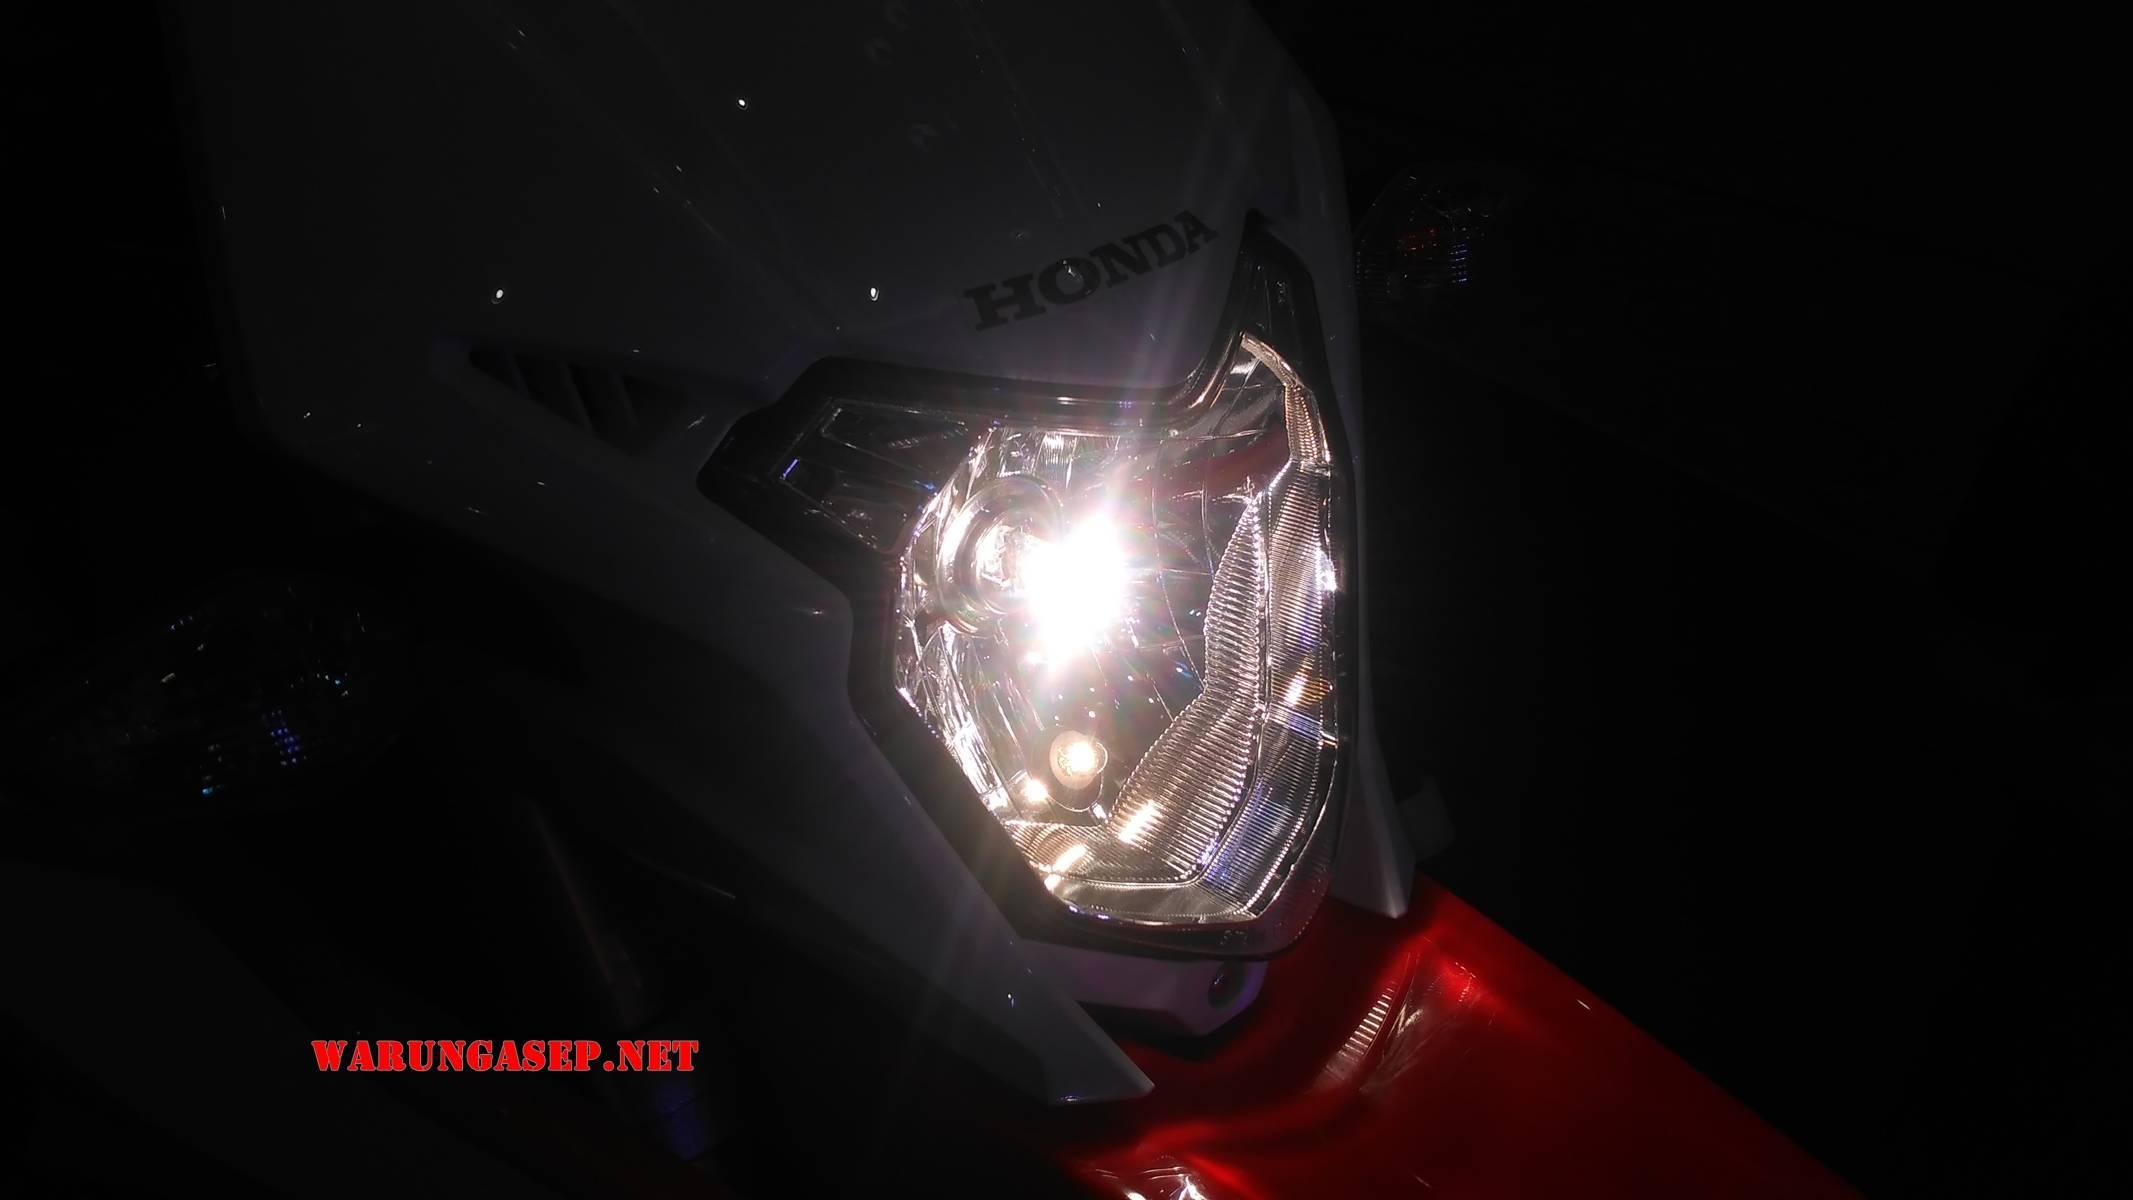 honda crf150l 2018-069- warungasep